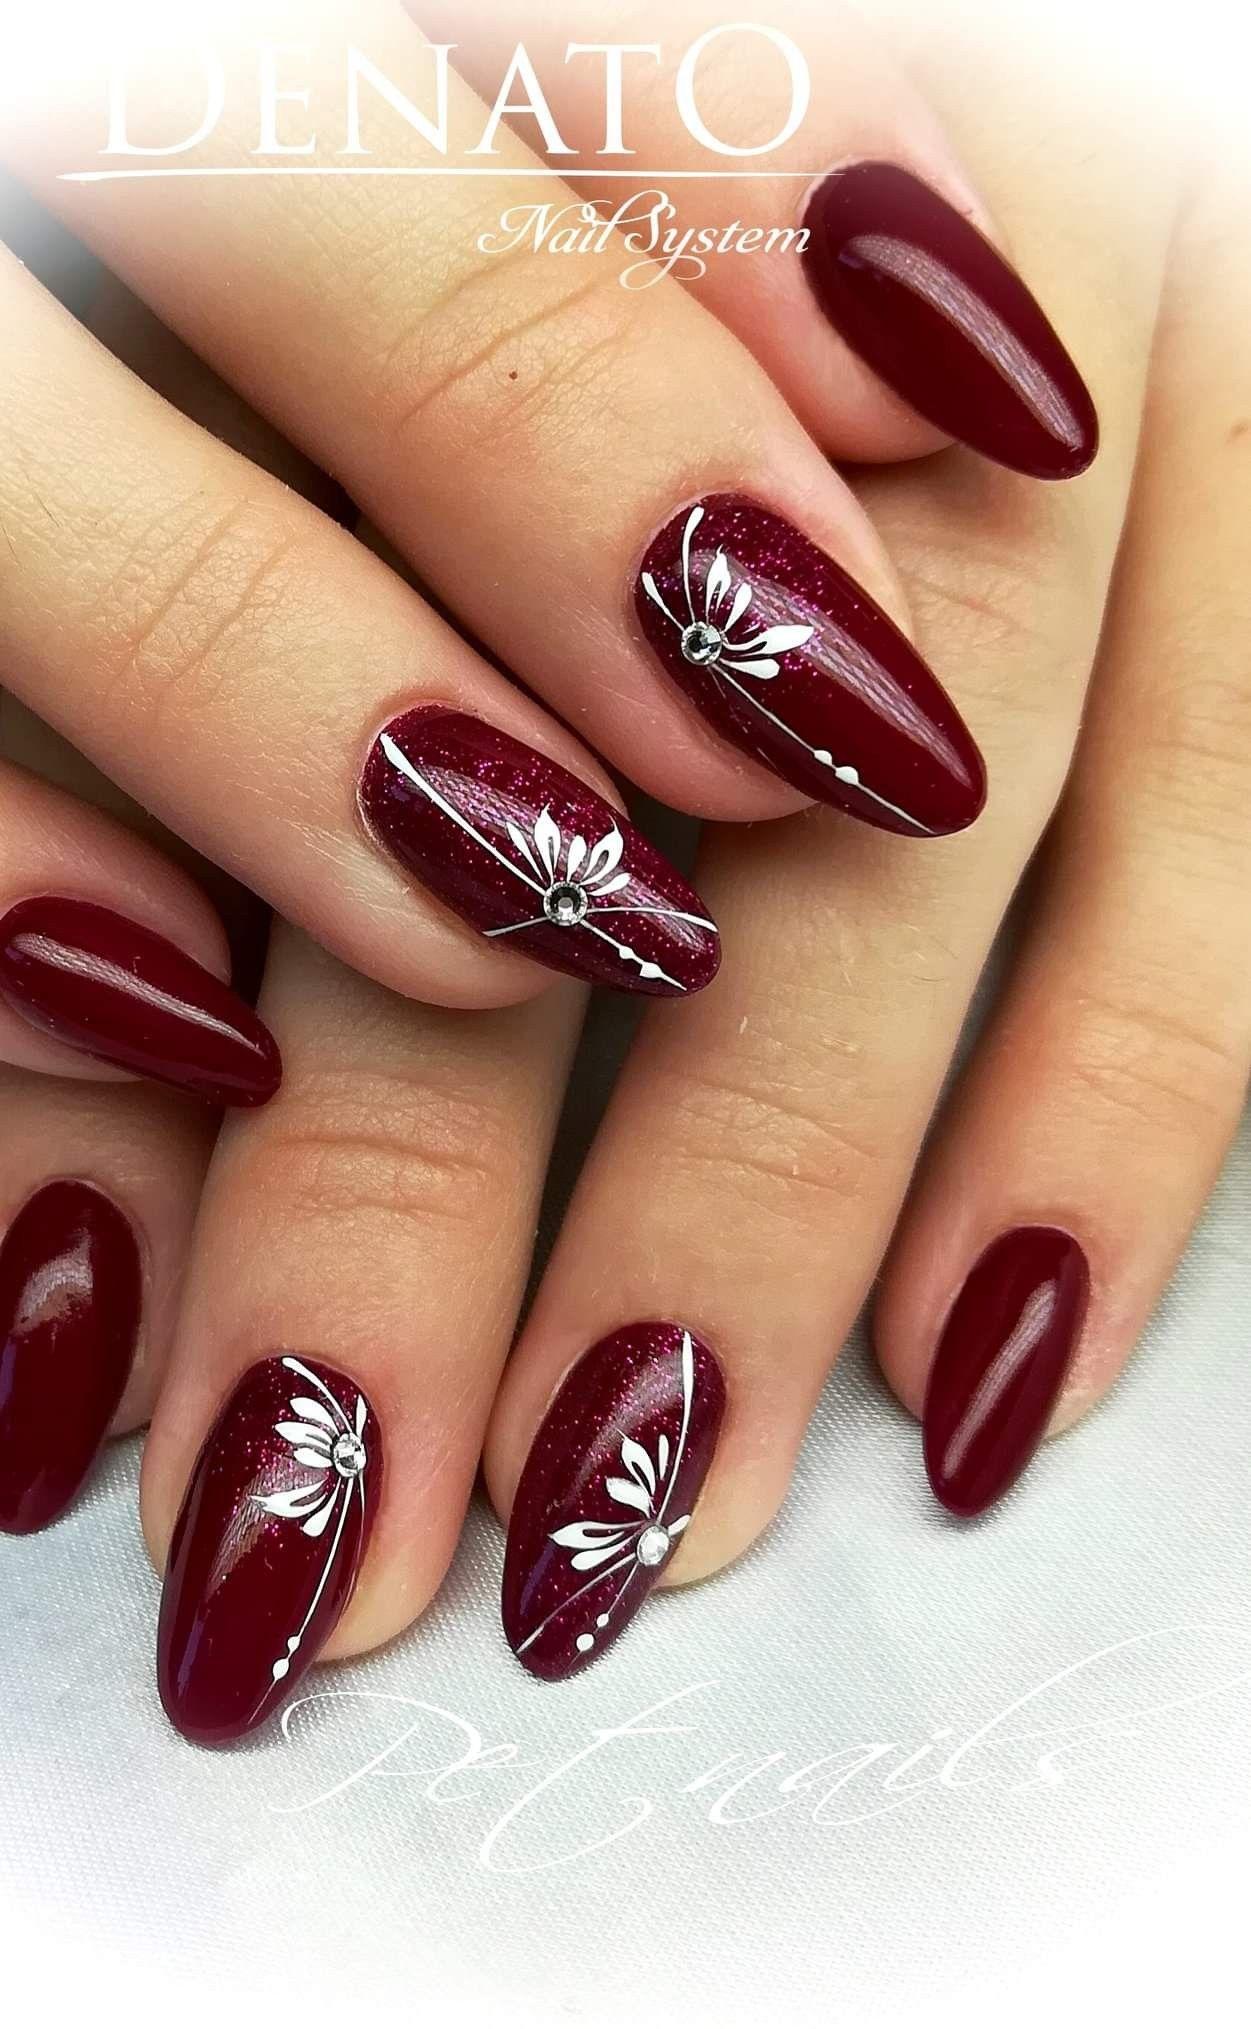 Lovely Nails Even Better For Christmas Krasivye Nogti Gelevye Nogti Dizajnerskie Nogti